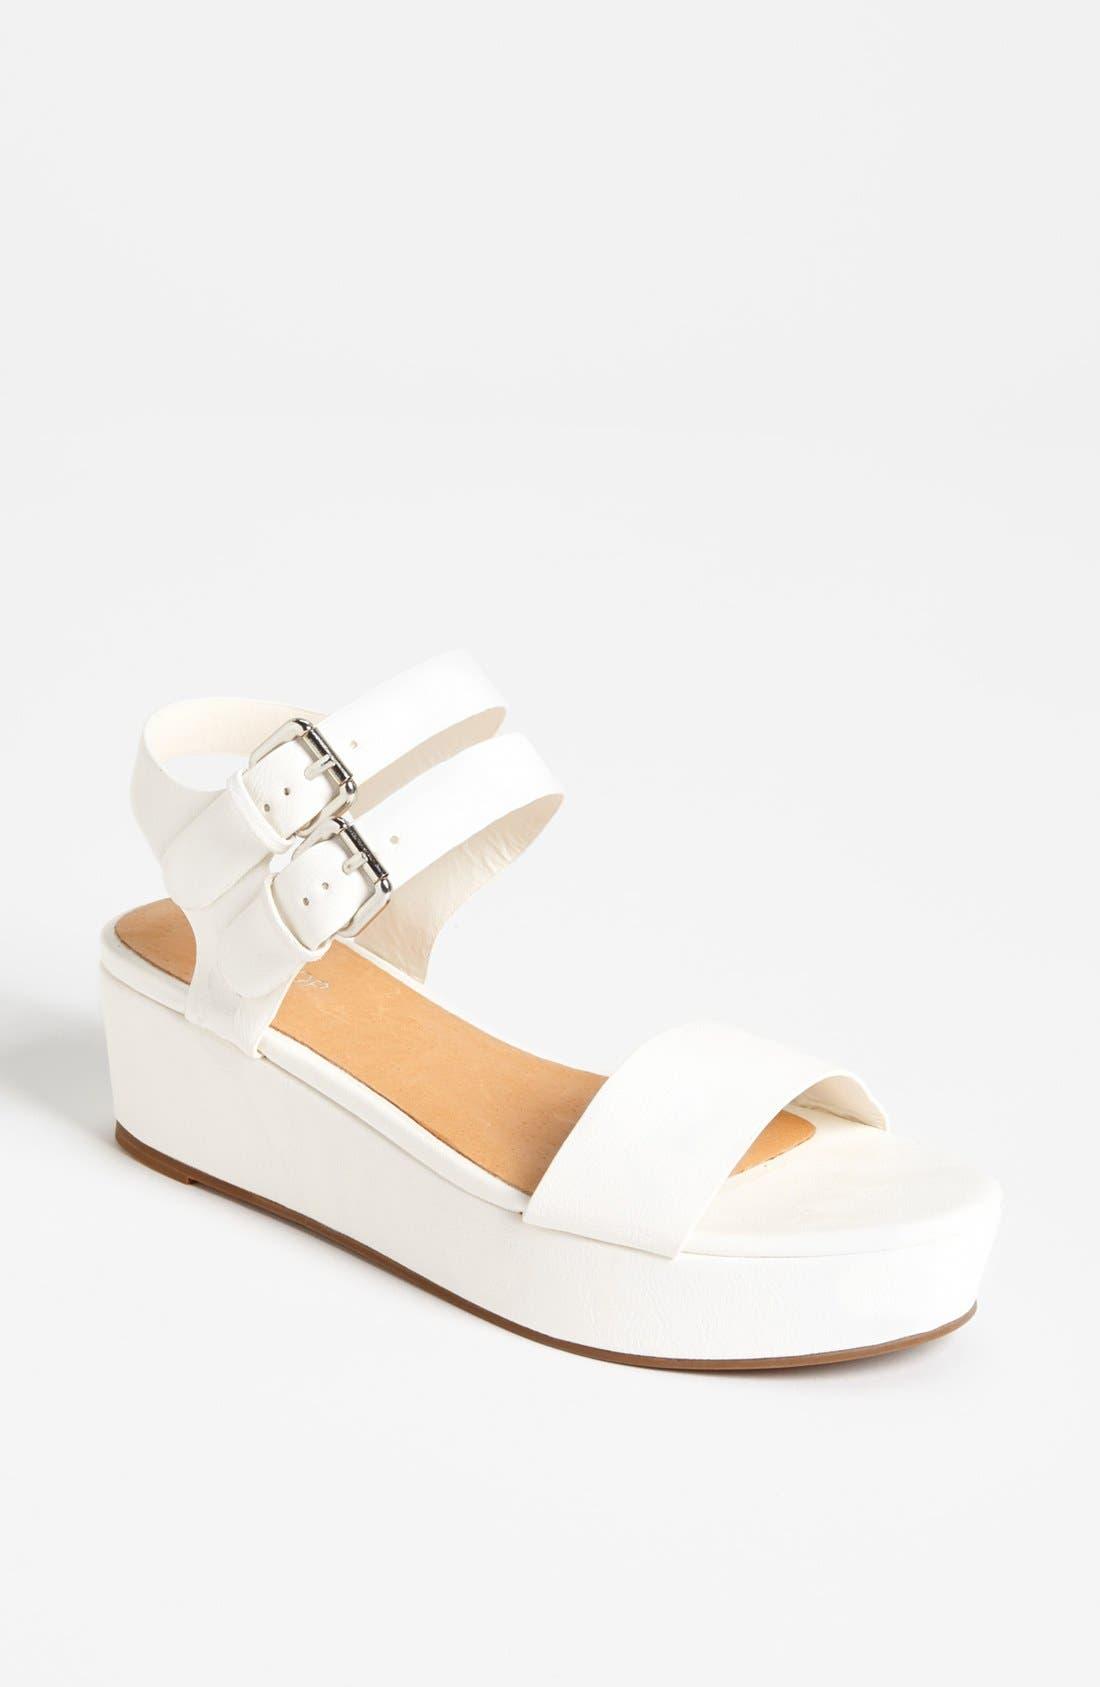 Alternate Image 1 Selected - Topshop 'Hanna' Sandal